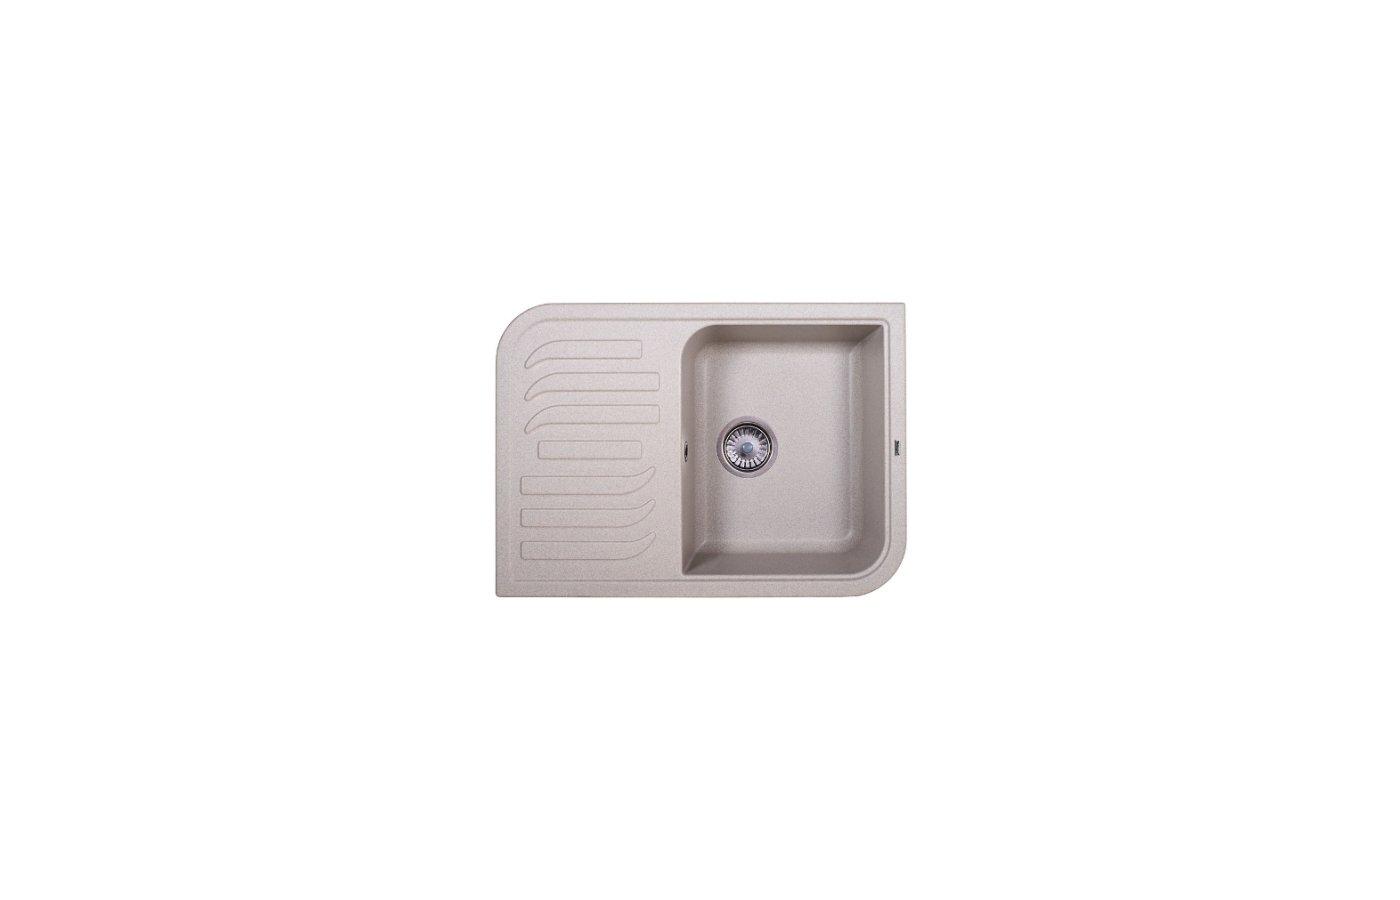 Кухонная мойка Weissgauff SOFTLINE 695 Eco Granit серый шелк